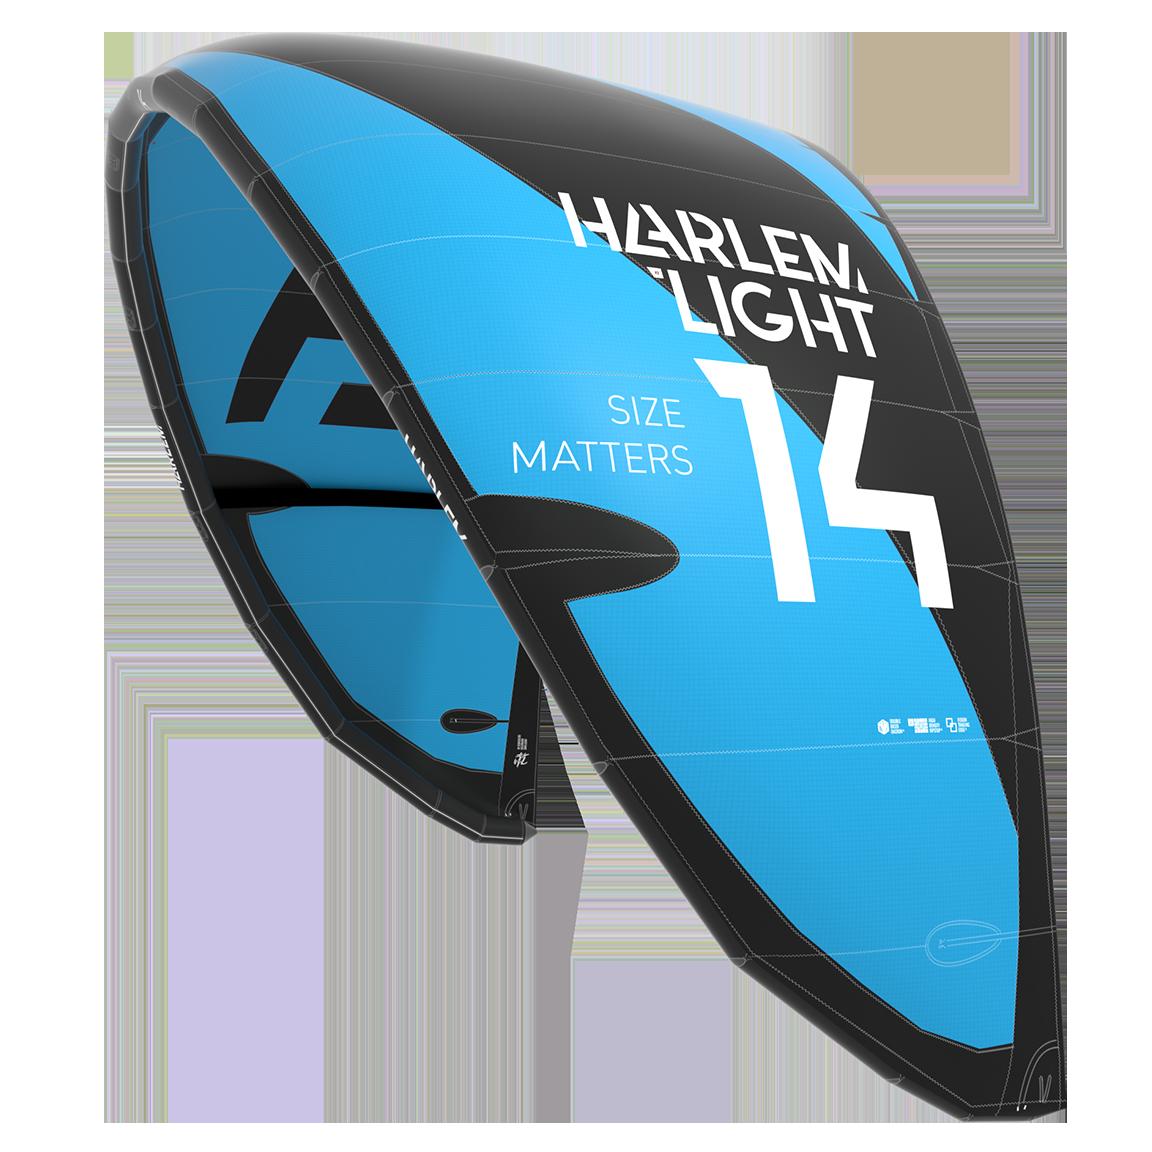 harlem-light-v2-overview